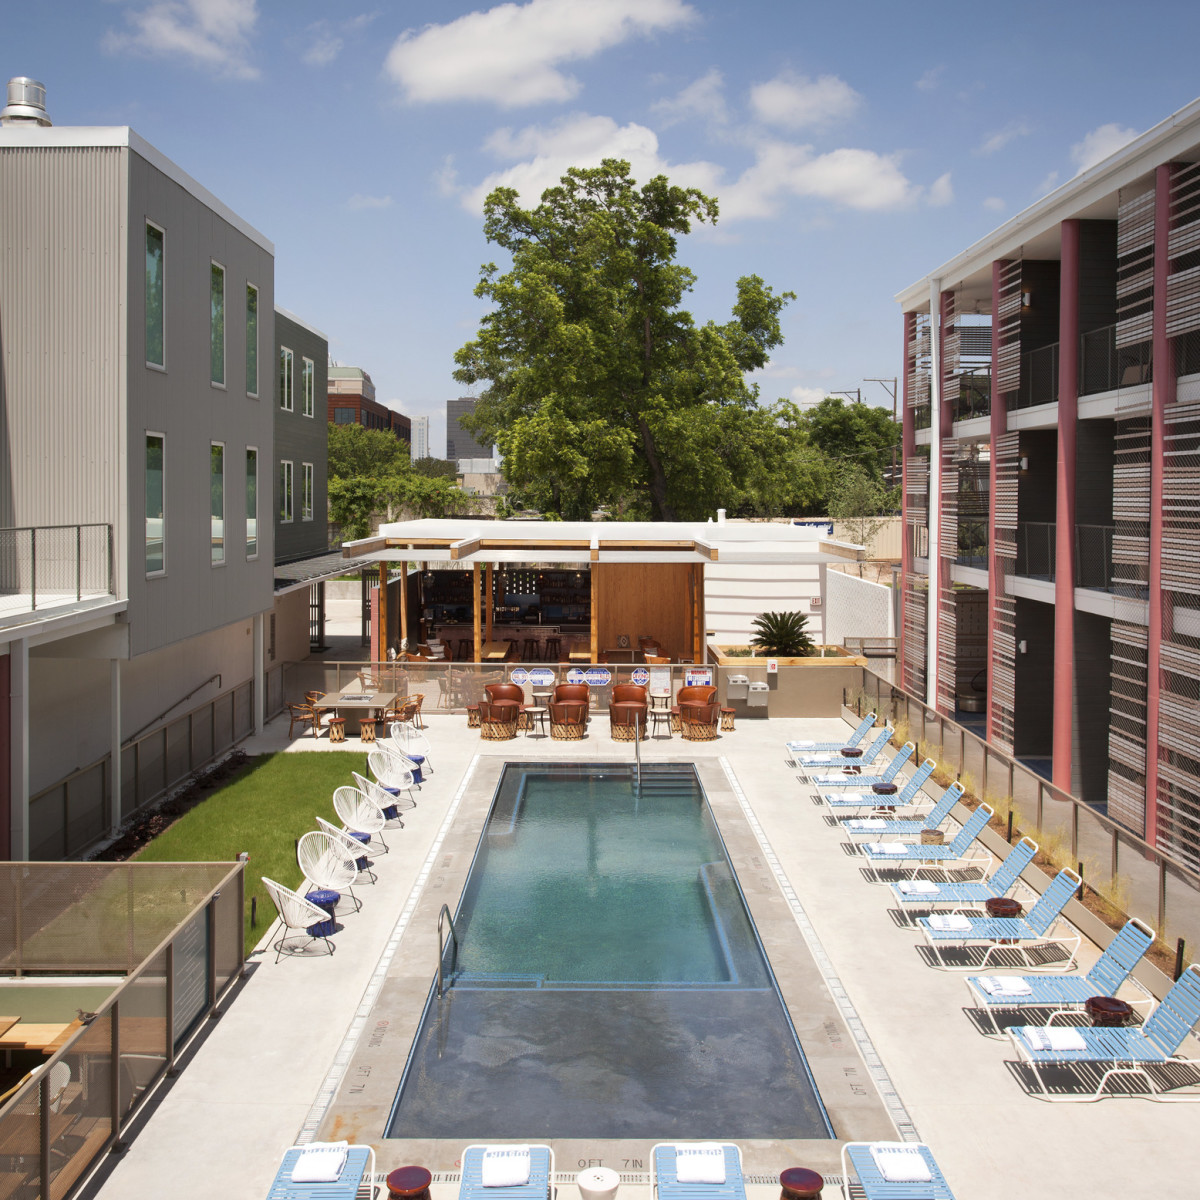 East Austin Hotel pool